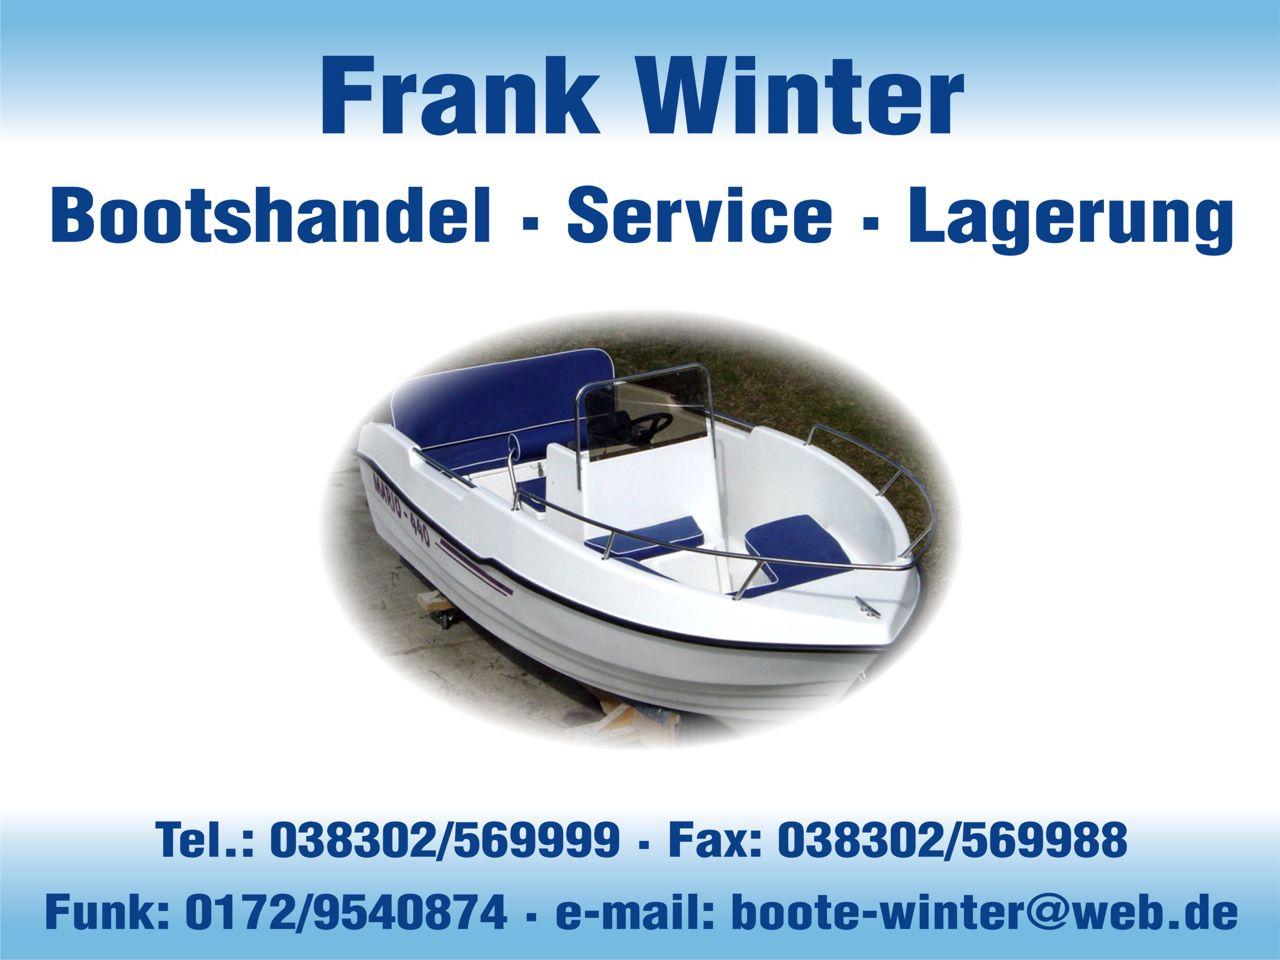 Frank Winter